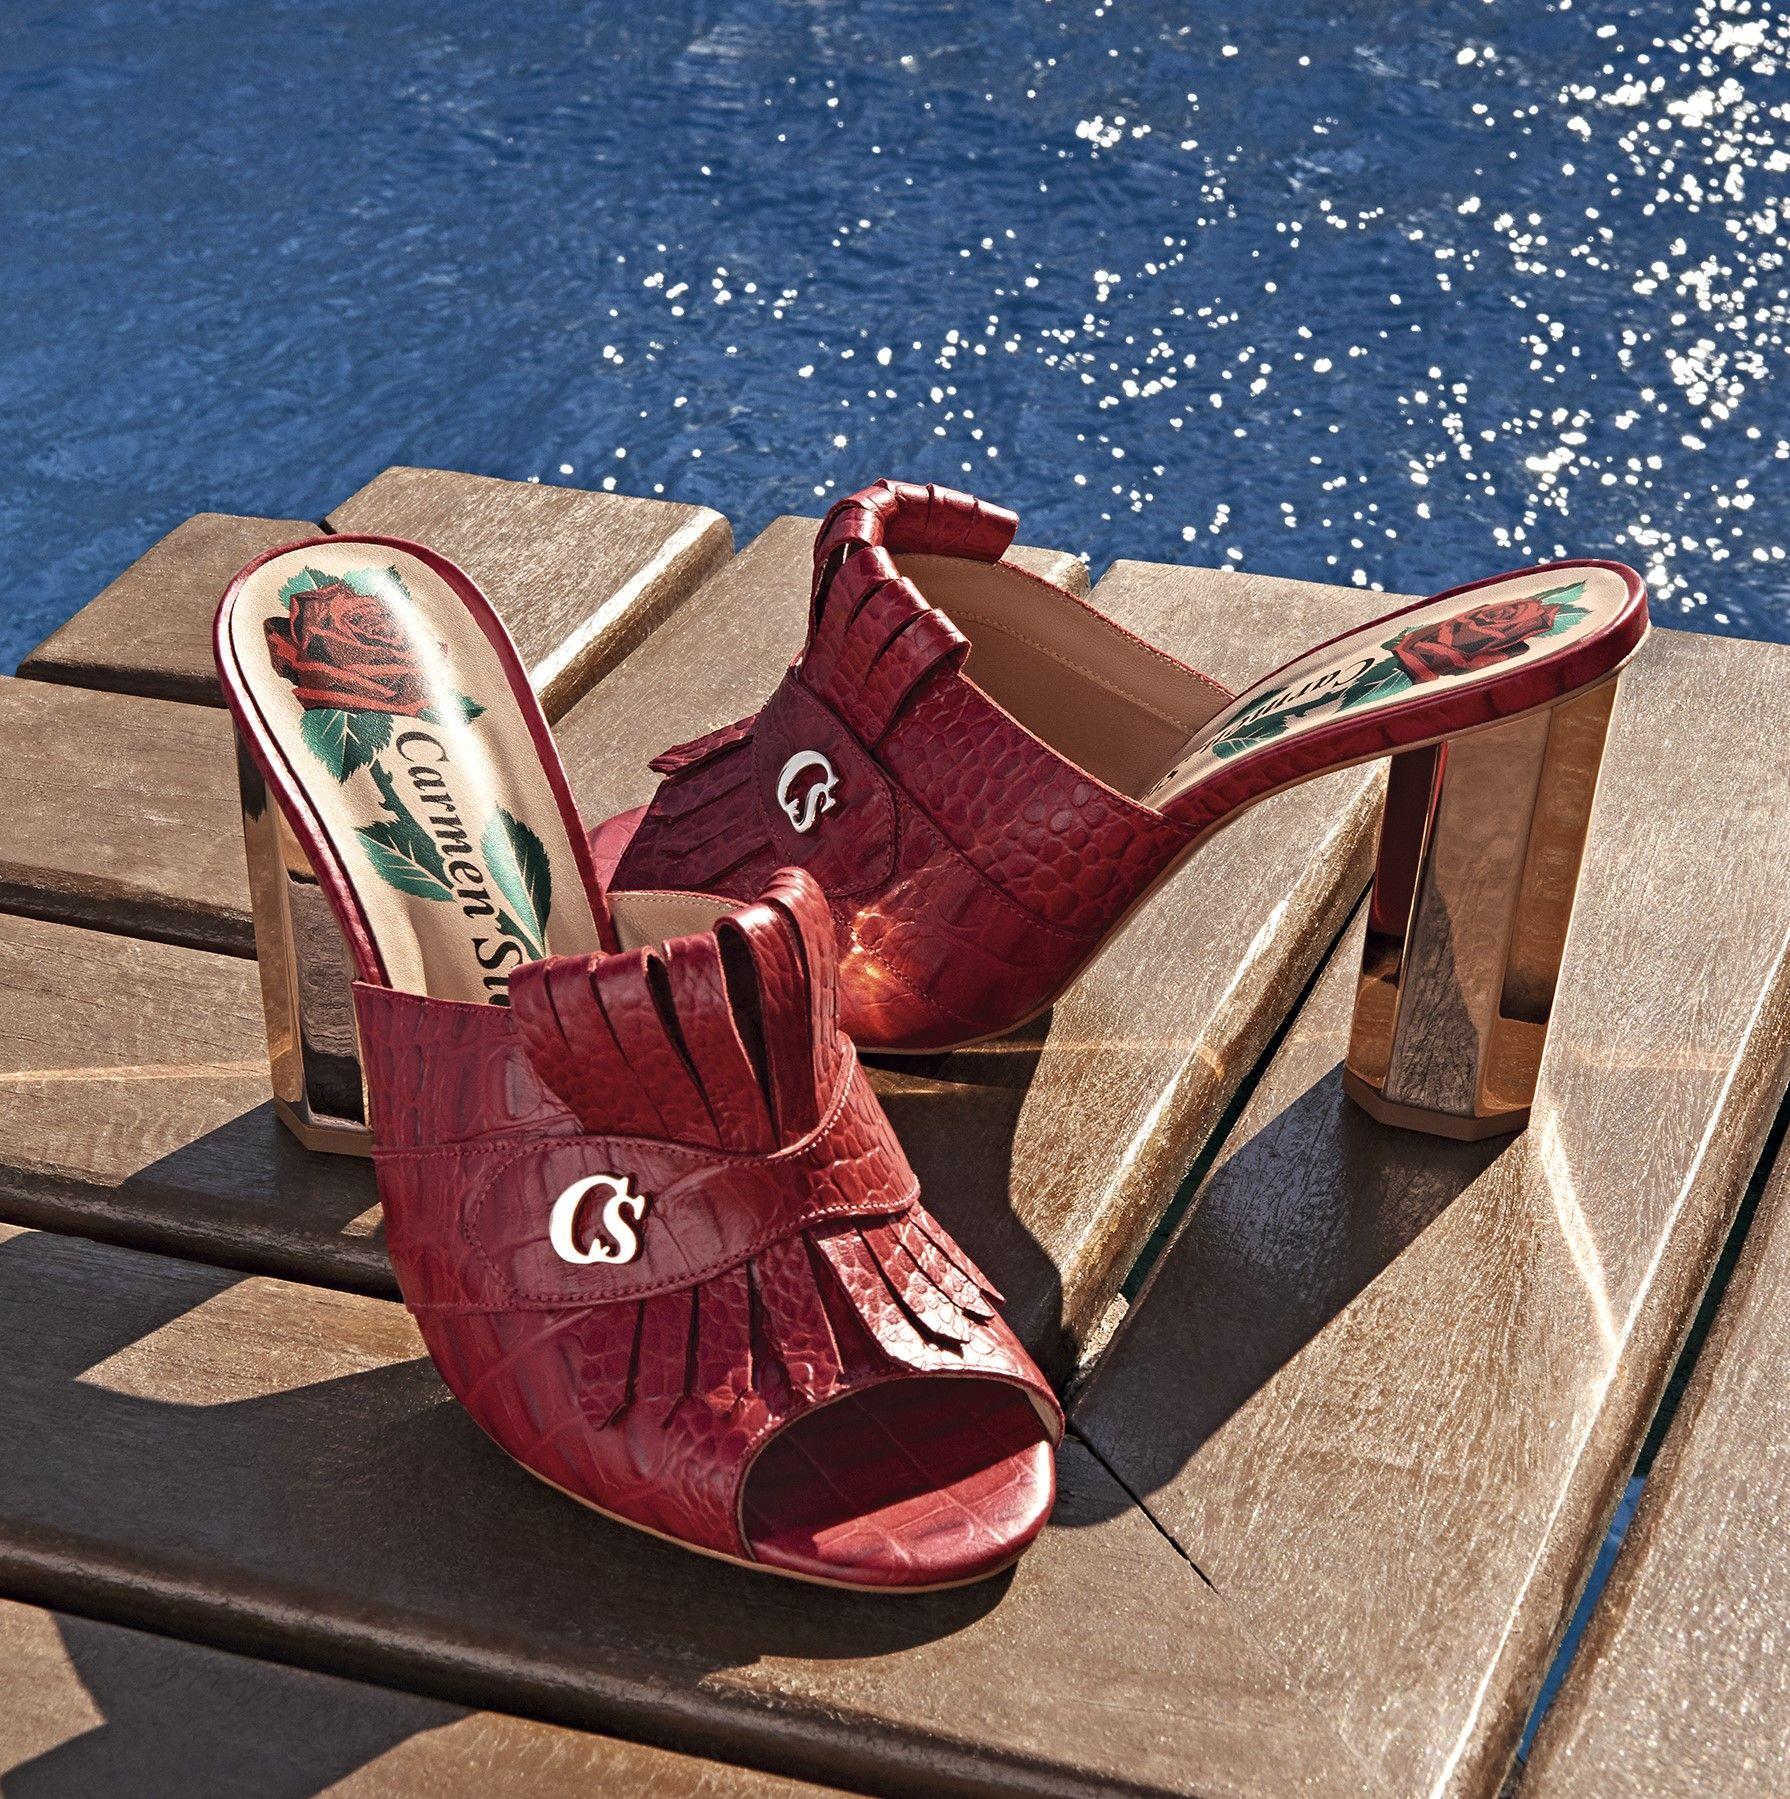 8d33fc069 Tamanco RED POWER Carmen Steffens! Roupas Exclusivas, Sapatos Fashion,  Saltos, Salto Alto